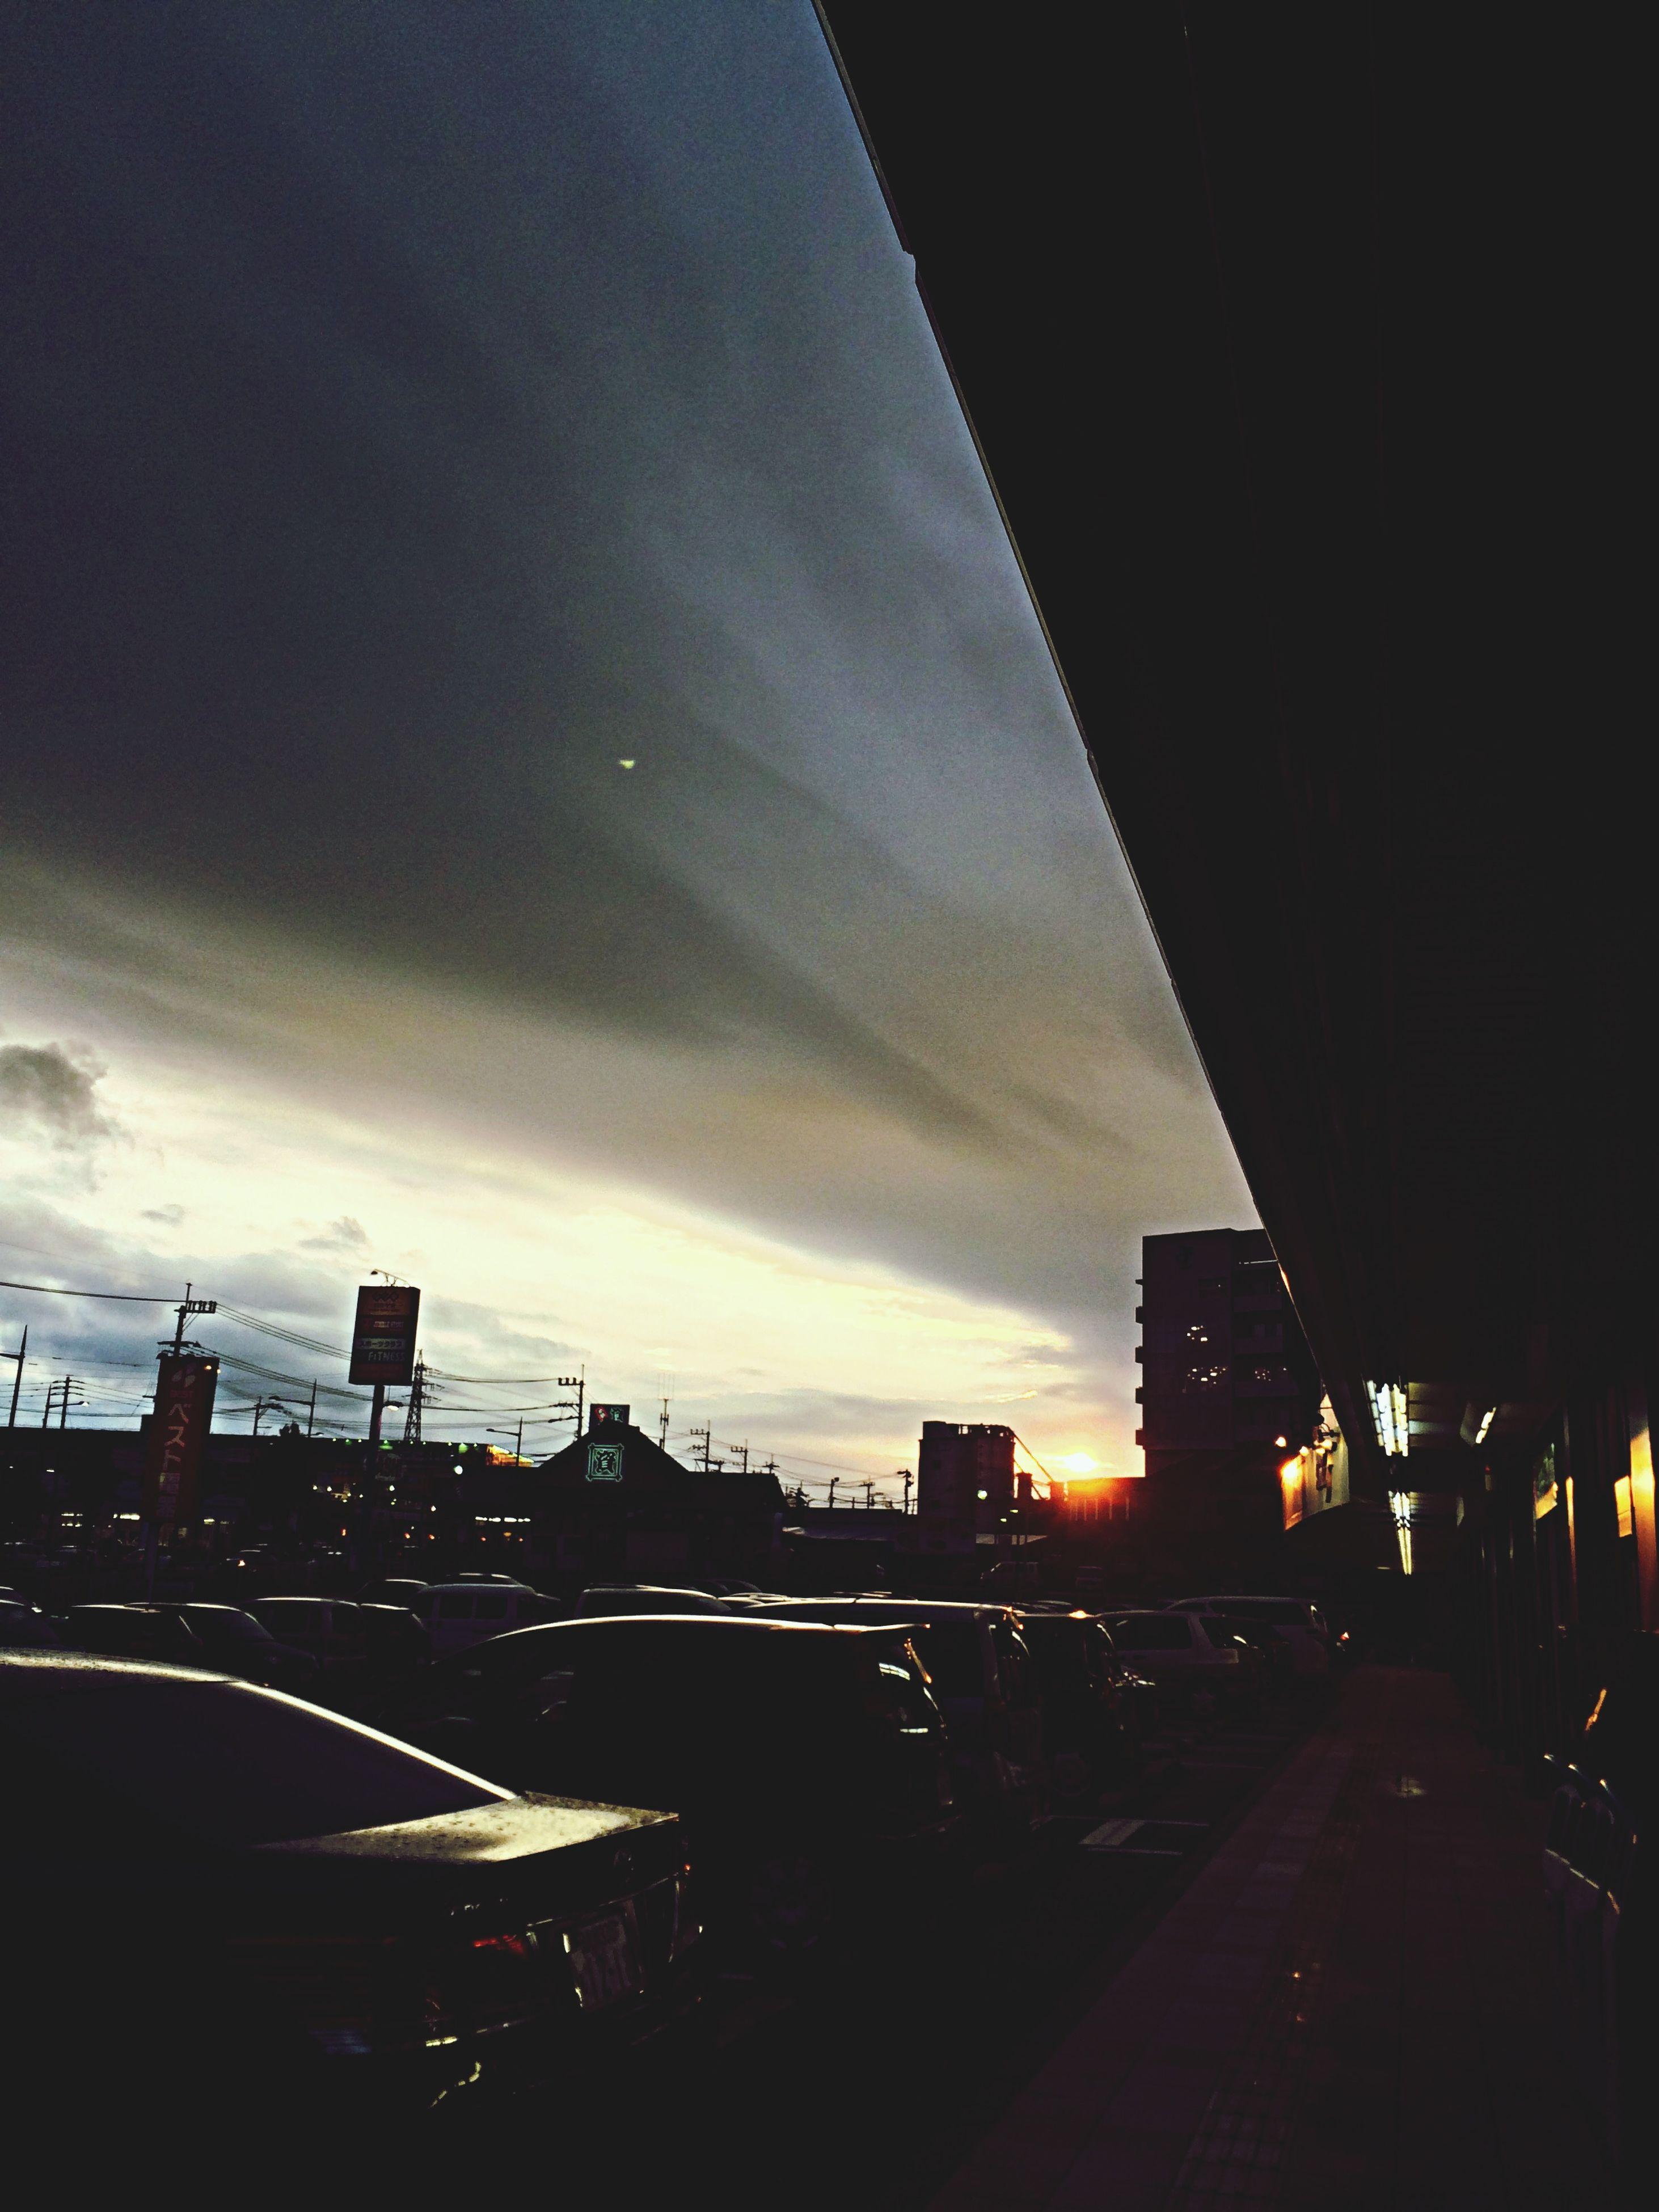 architecture, building exterior, built structure, sky, city, sunset, illuminated, transportation, cloud - sky, road, car, dusk, street, silhouette, city life, cityscape, night, land vehicle, street light, outdoors